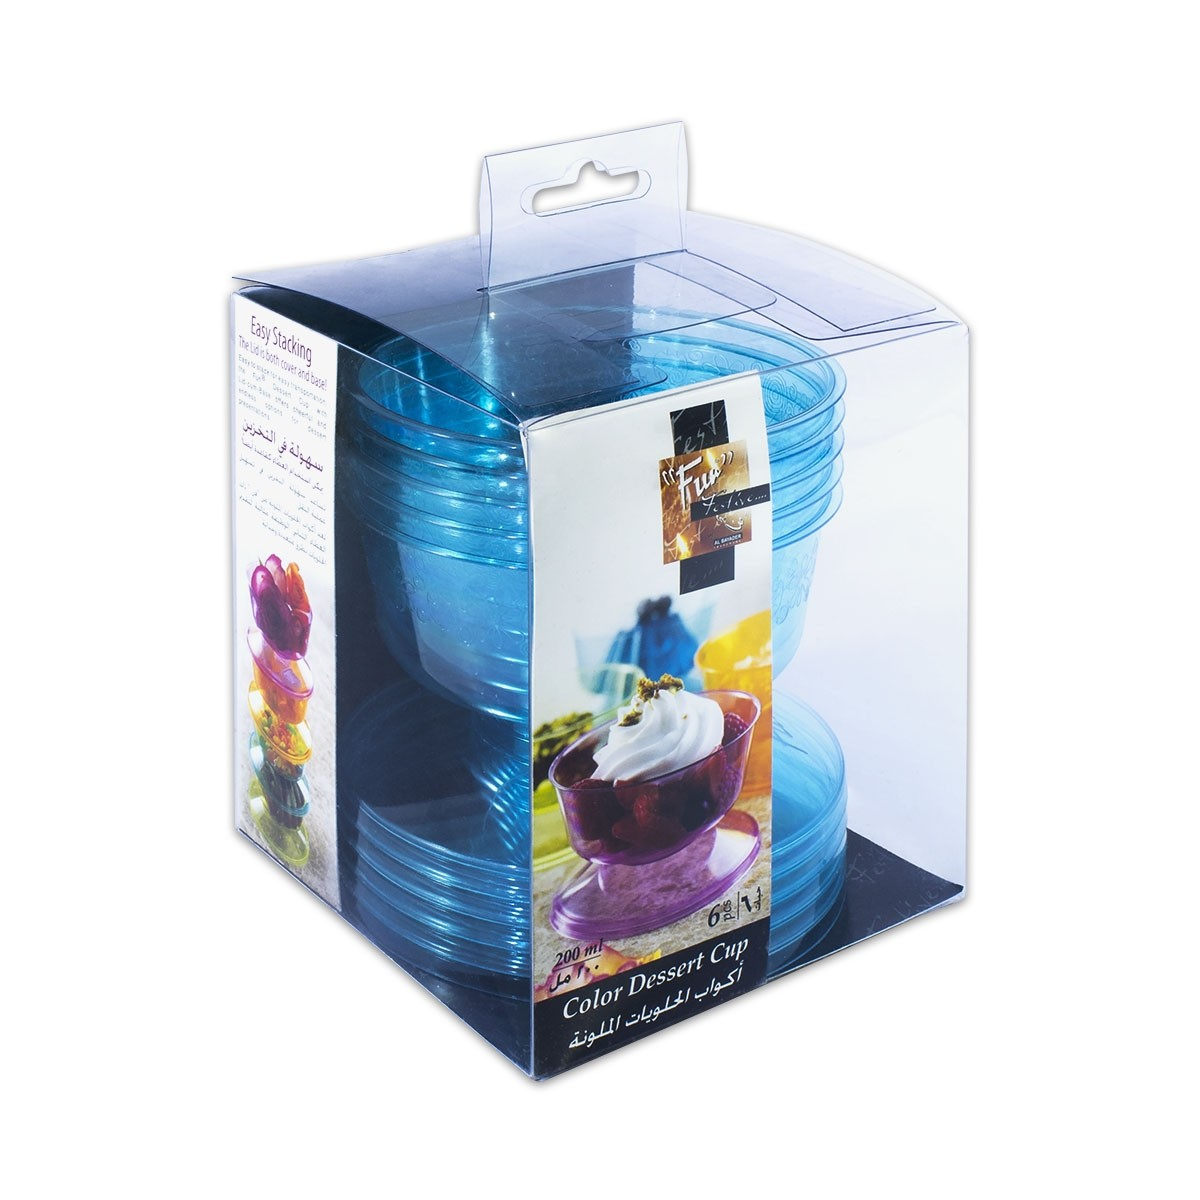 Fun® Coloured Dessert Cup - Turquoise | 6pcsx24pkts